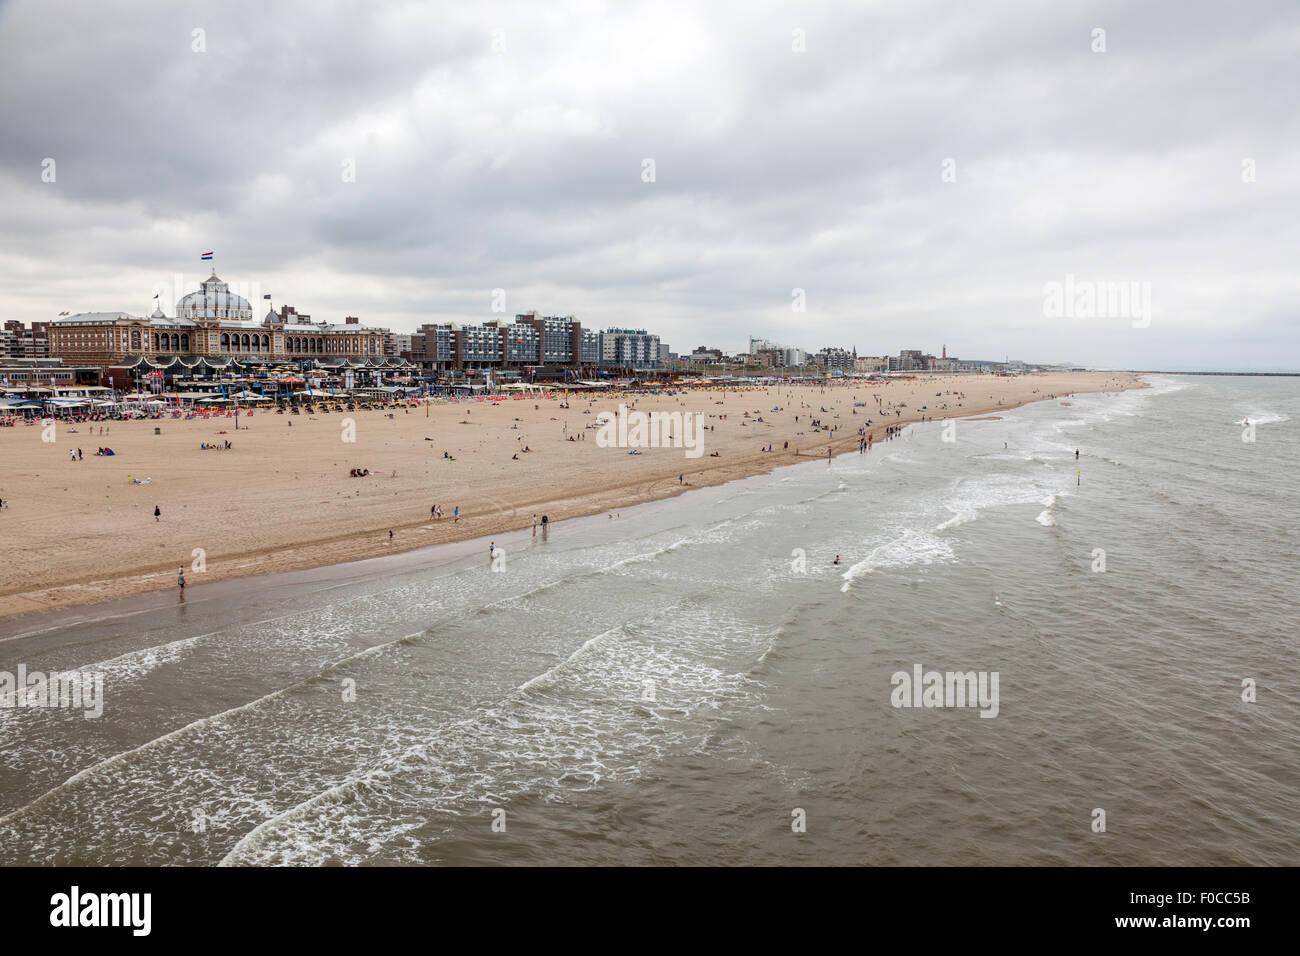 North Sea coast in Scheveningen, Holland - Stock Image